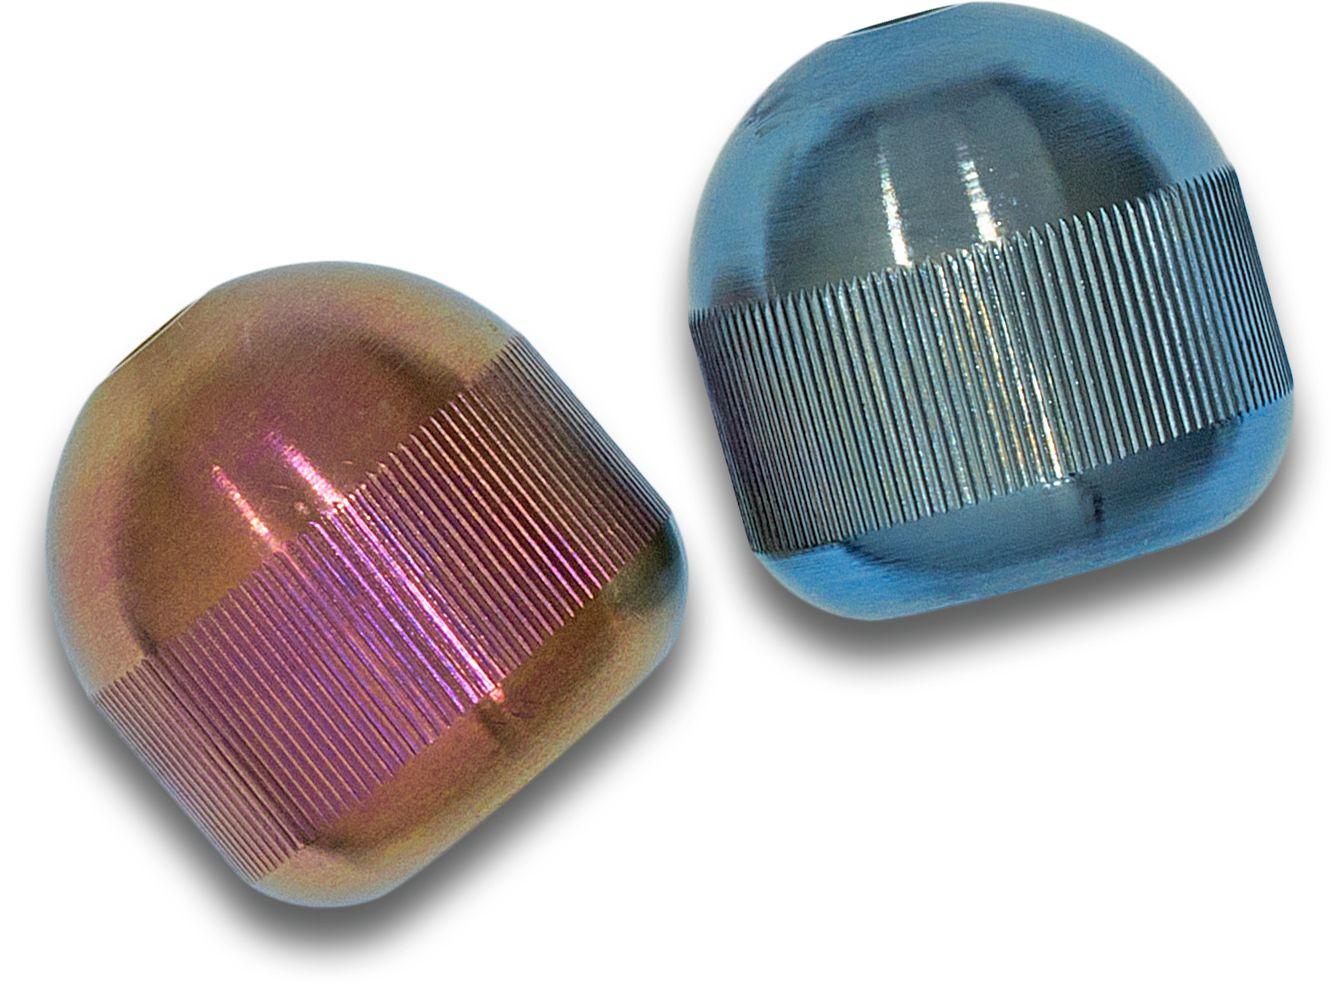 Aroundsquare AO2 Customized Titan Begleri, Blue and Pink Grahamodized